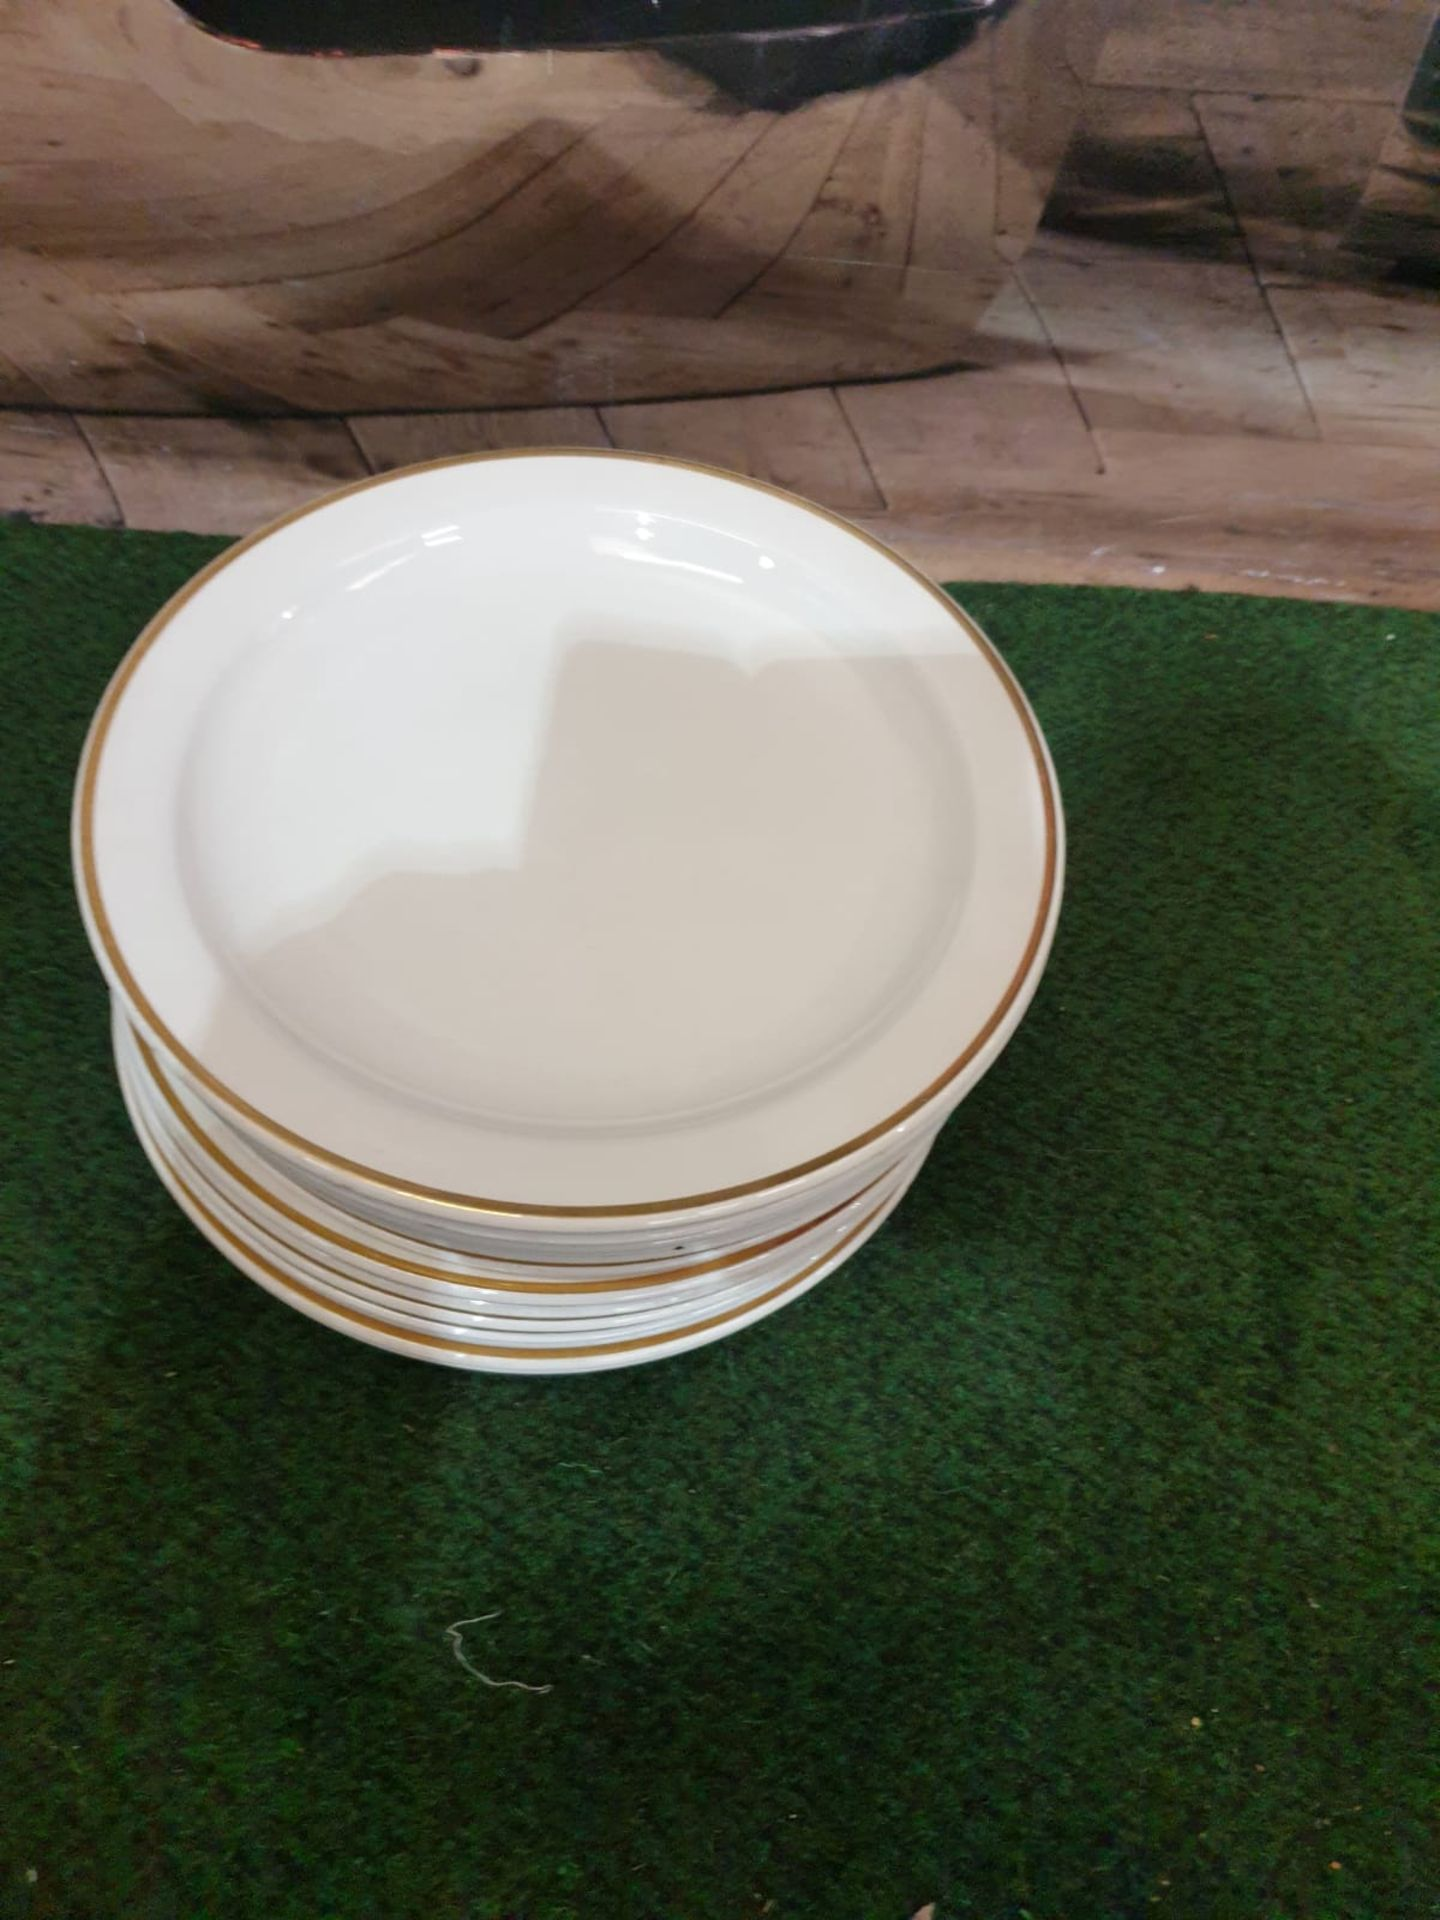 13 x Crown Ducal England Dinner plates White Gold rim 1971